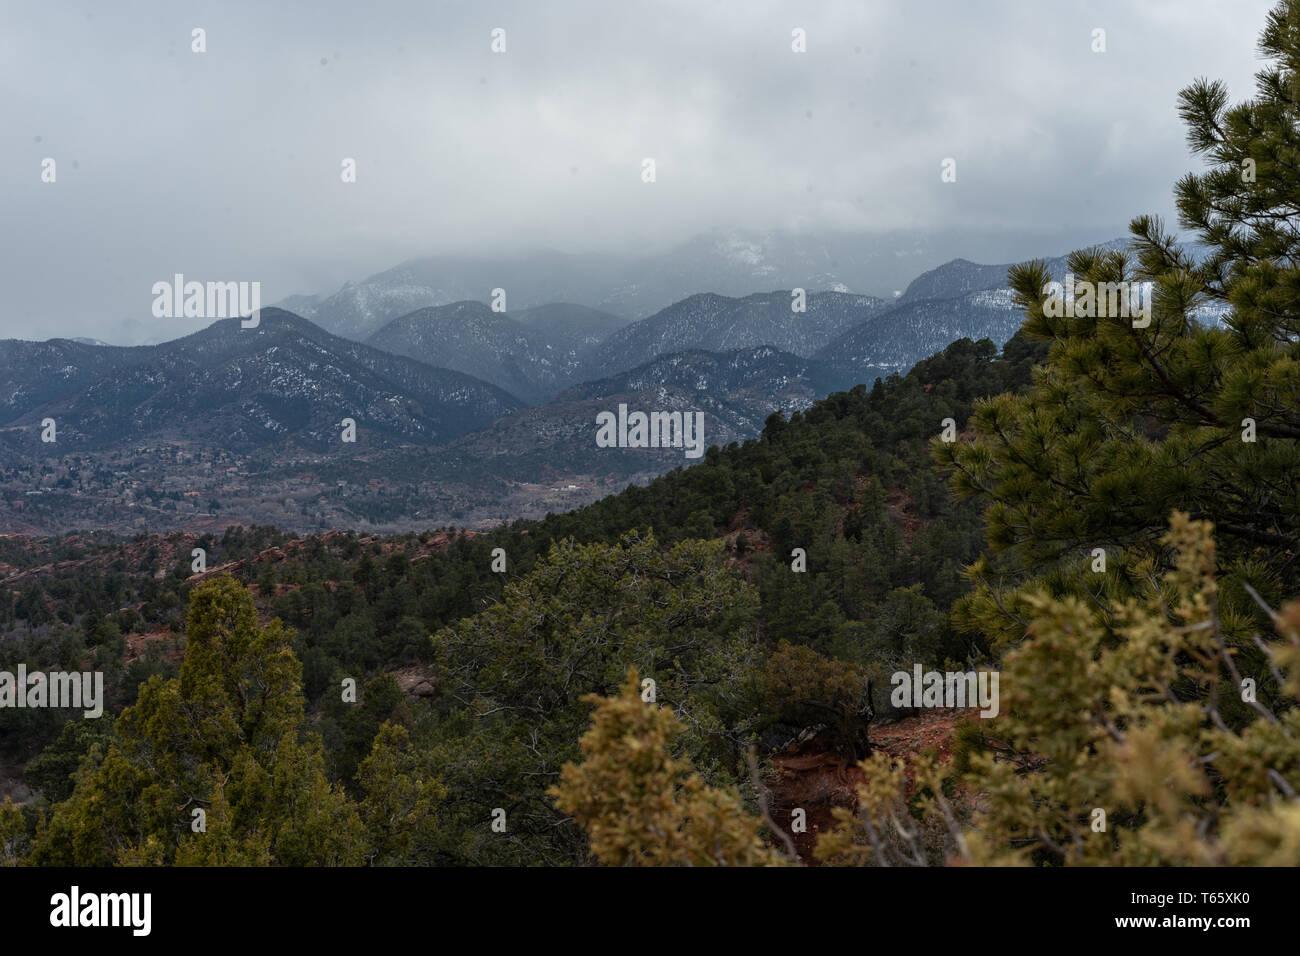 Garden of the gods park, Colorado, USA - Stock Image